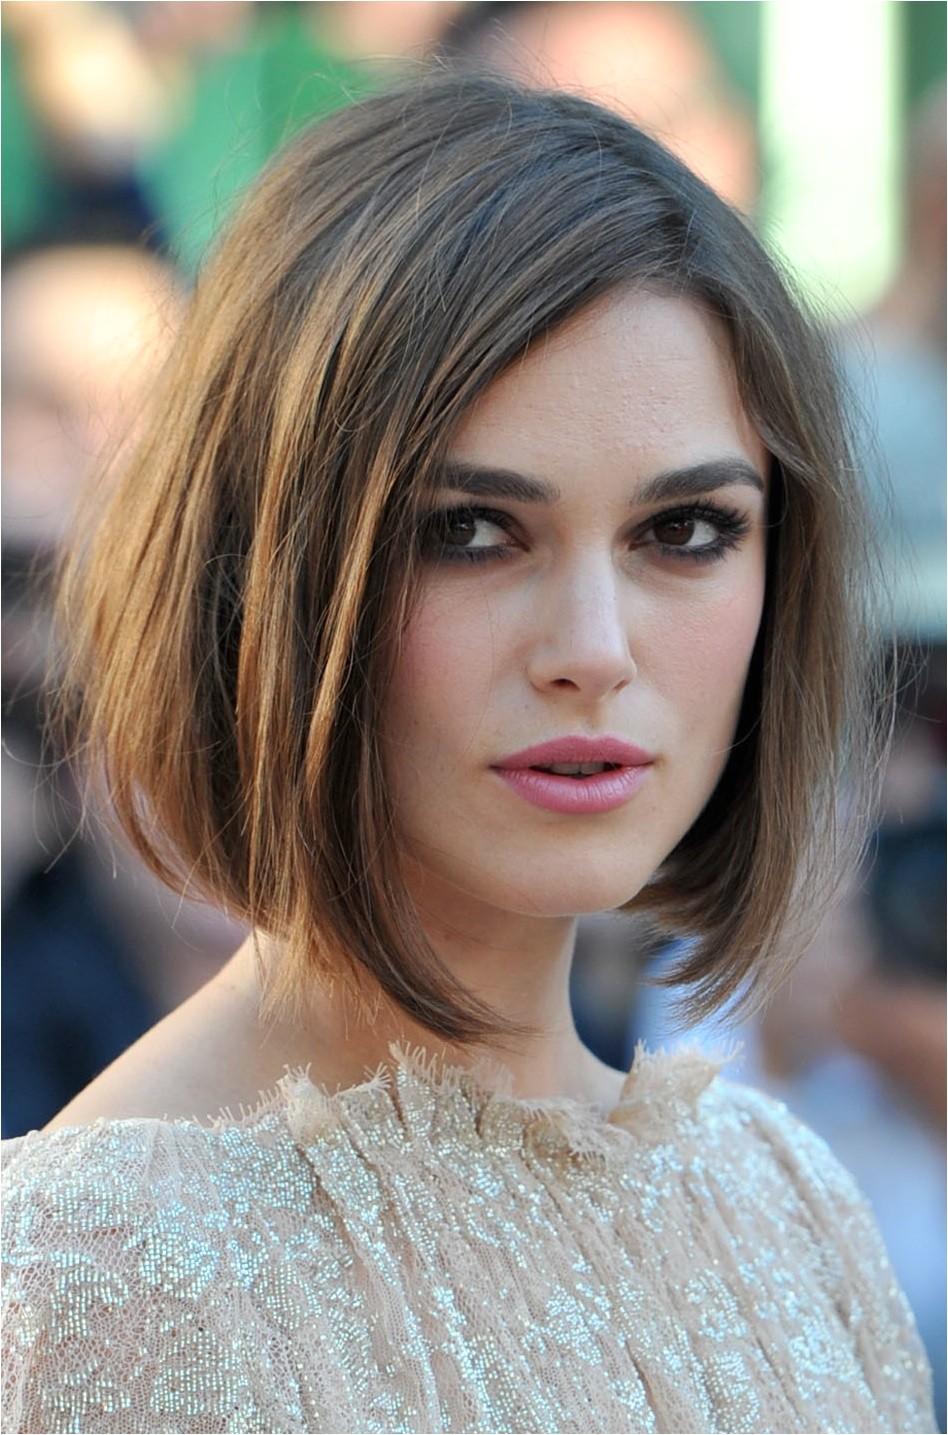 5 best hairstyles women 30s